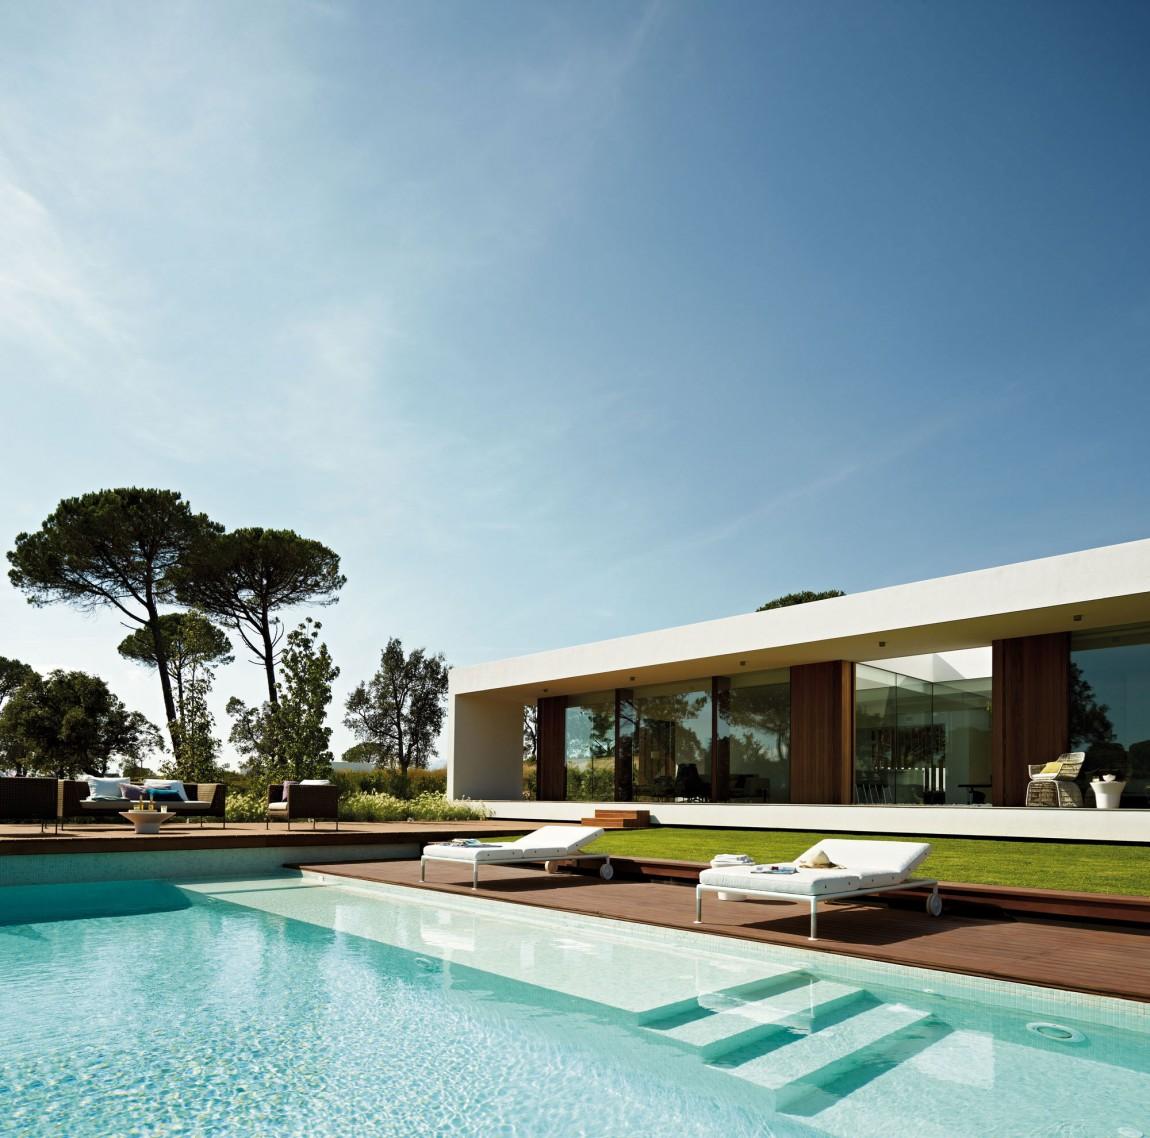 Contemporary Pool House: Modern Villa Indigo, Catalonia, Spain